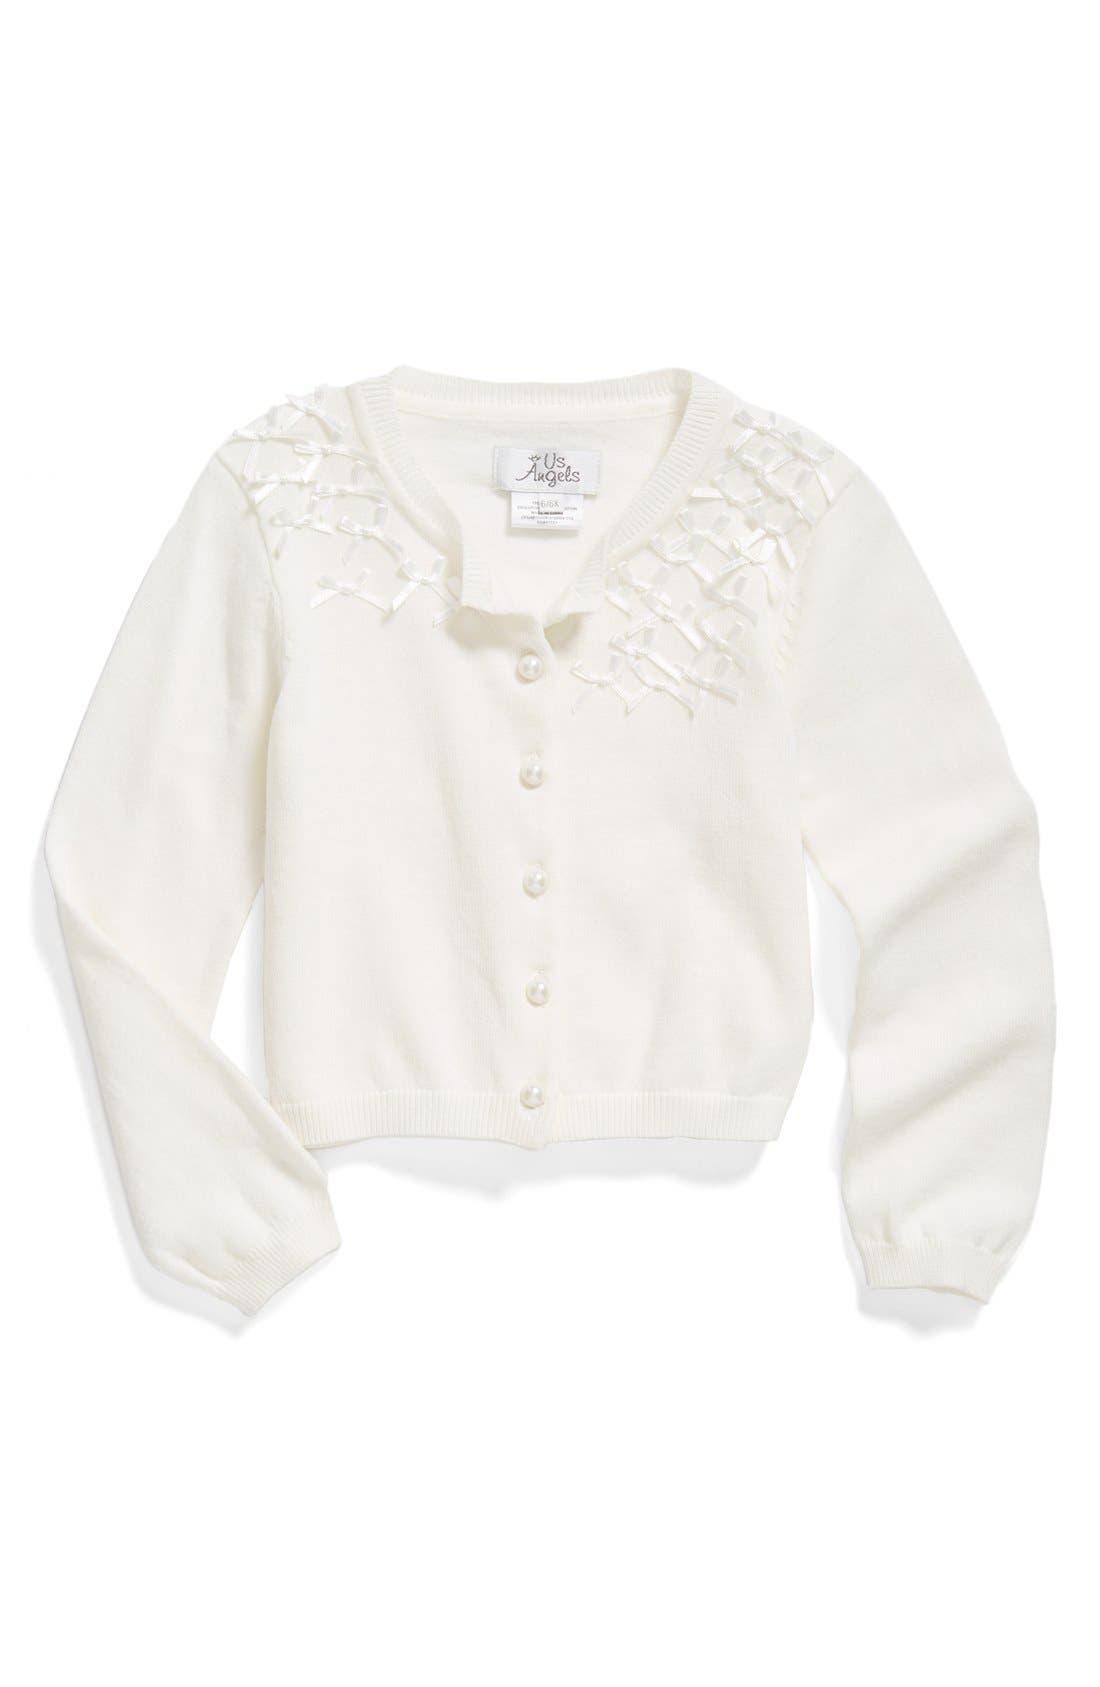 Us Angels Communion Cardigan Sweater (Toddler Girls, Little Girls & Big Girls)